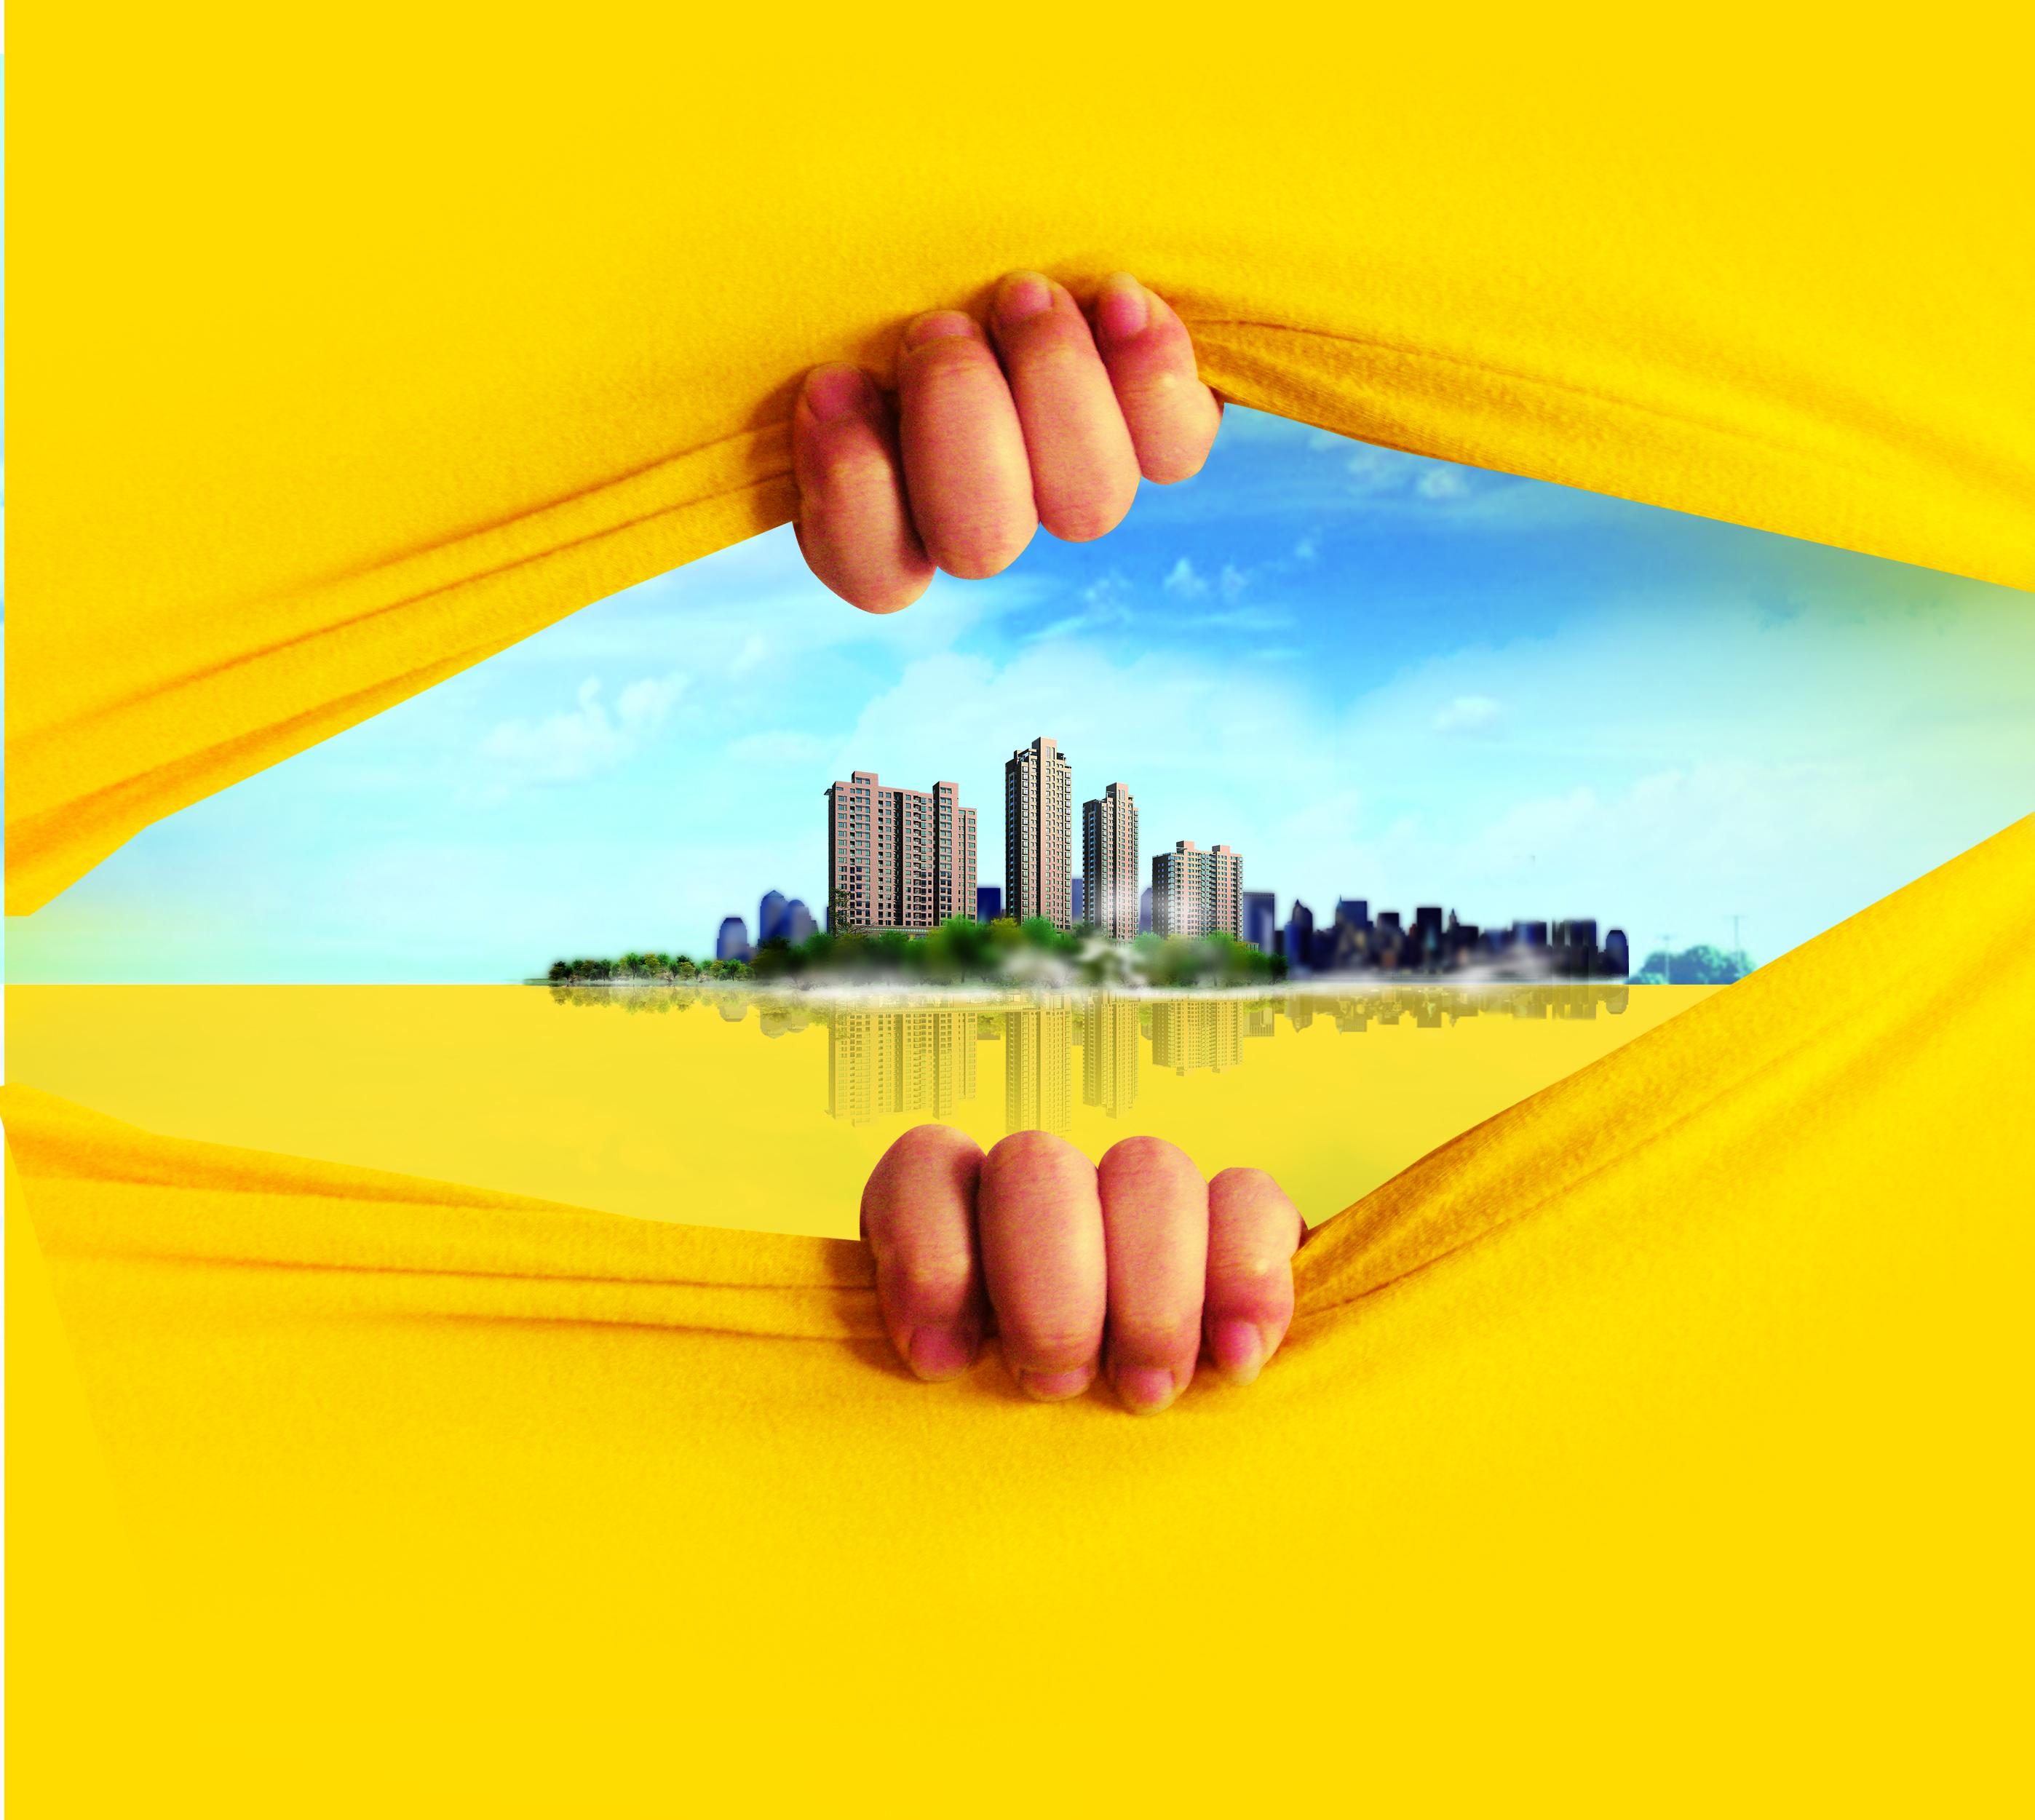 yellow background creative real estate ads  property Graduation Quotes Preschool Graduation Clip Art